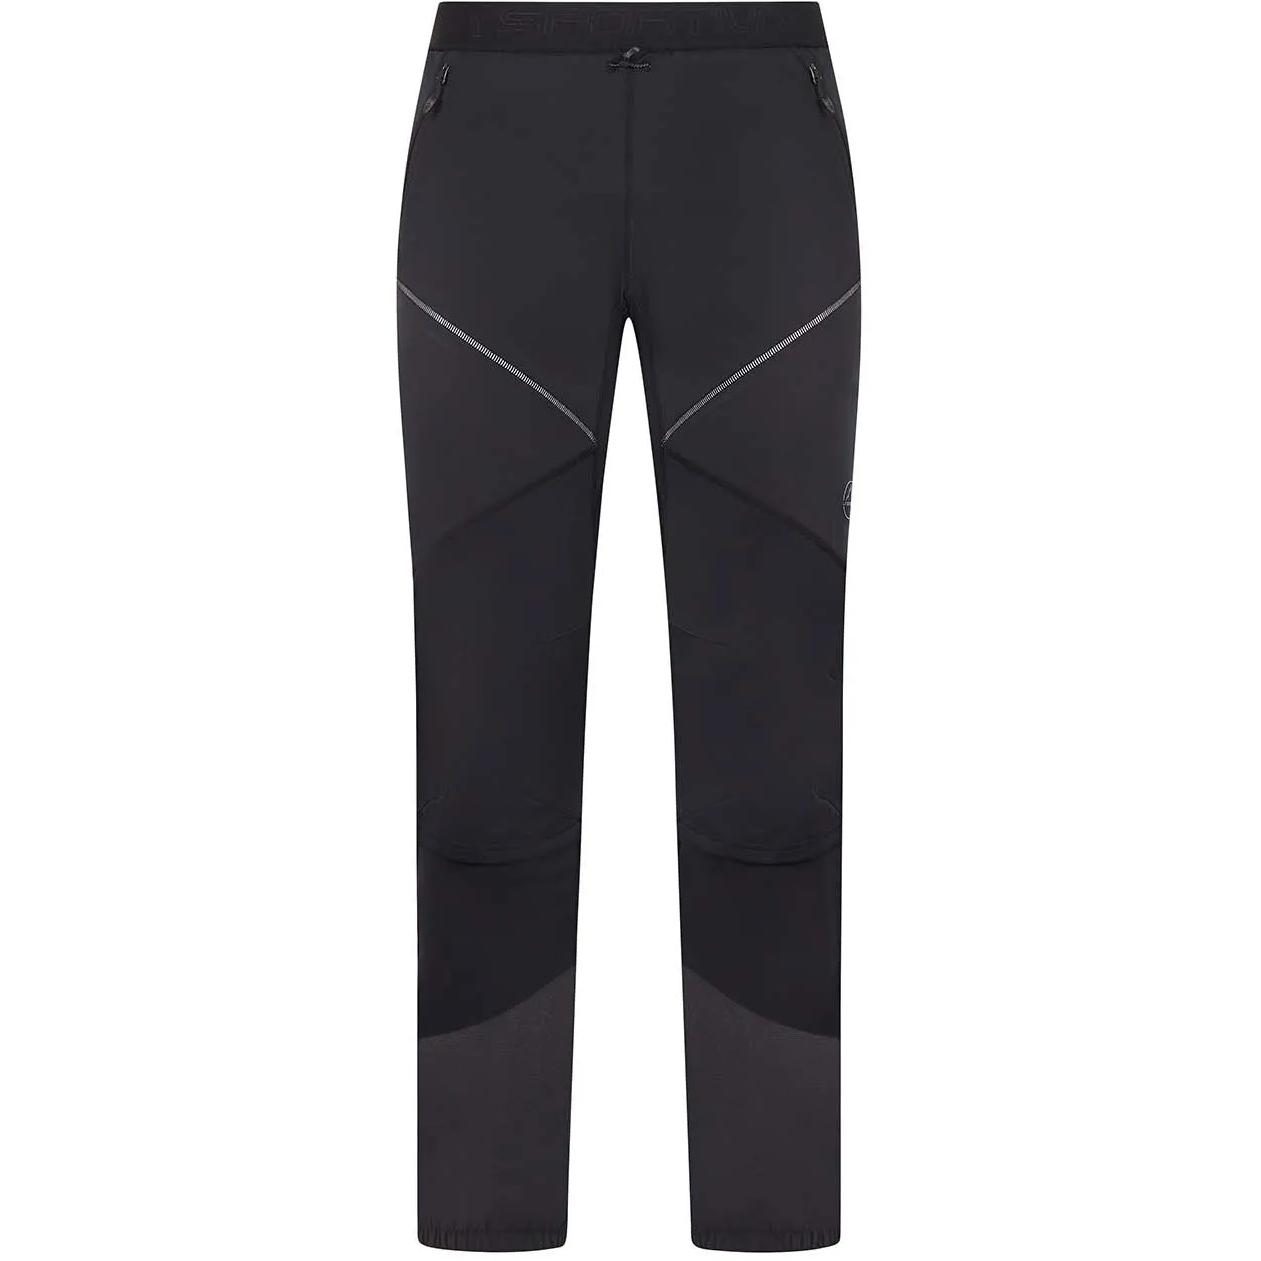 La Sportiva Ode Pants - Black